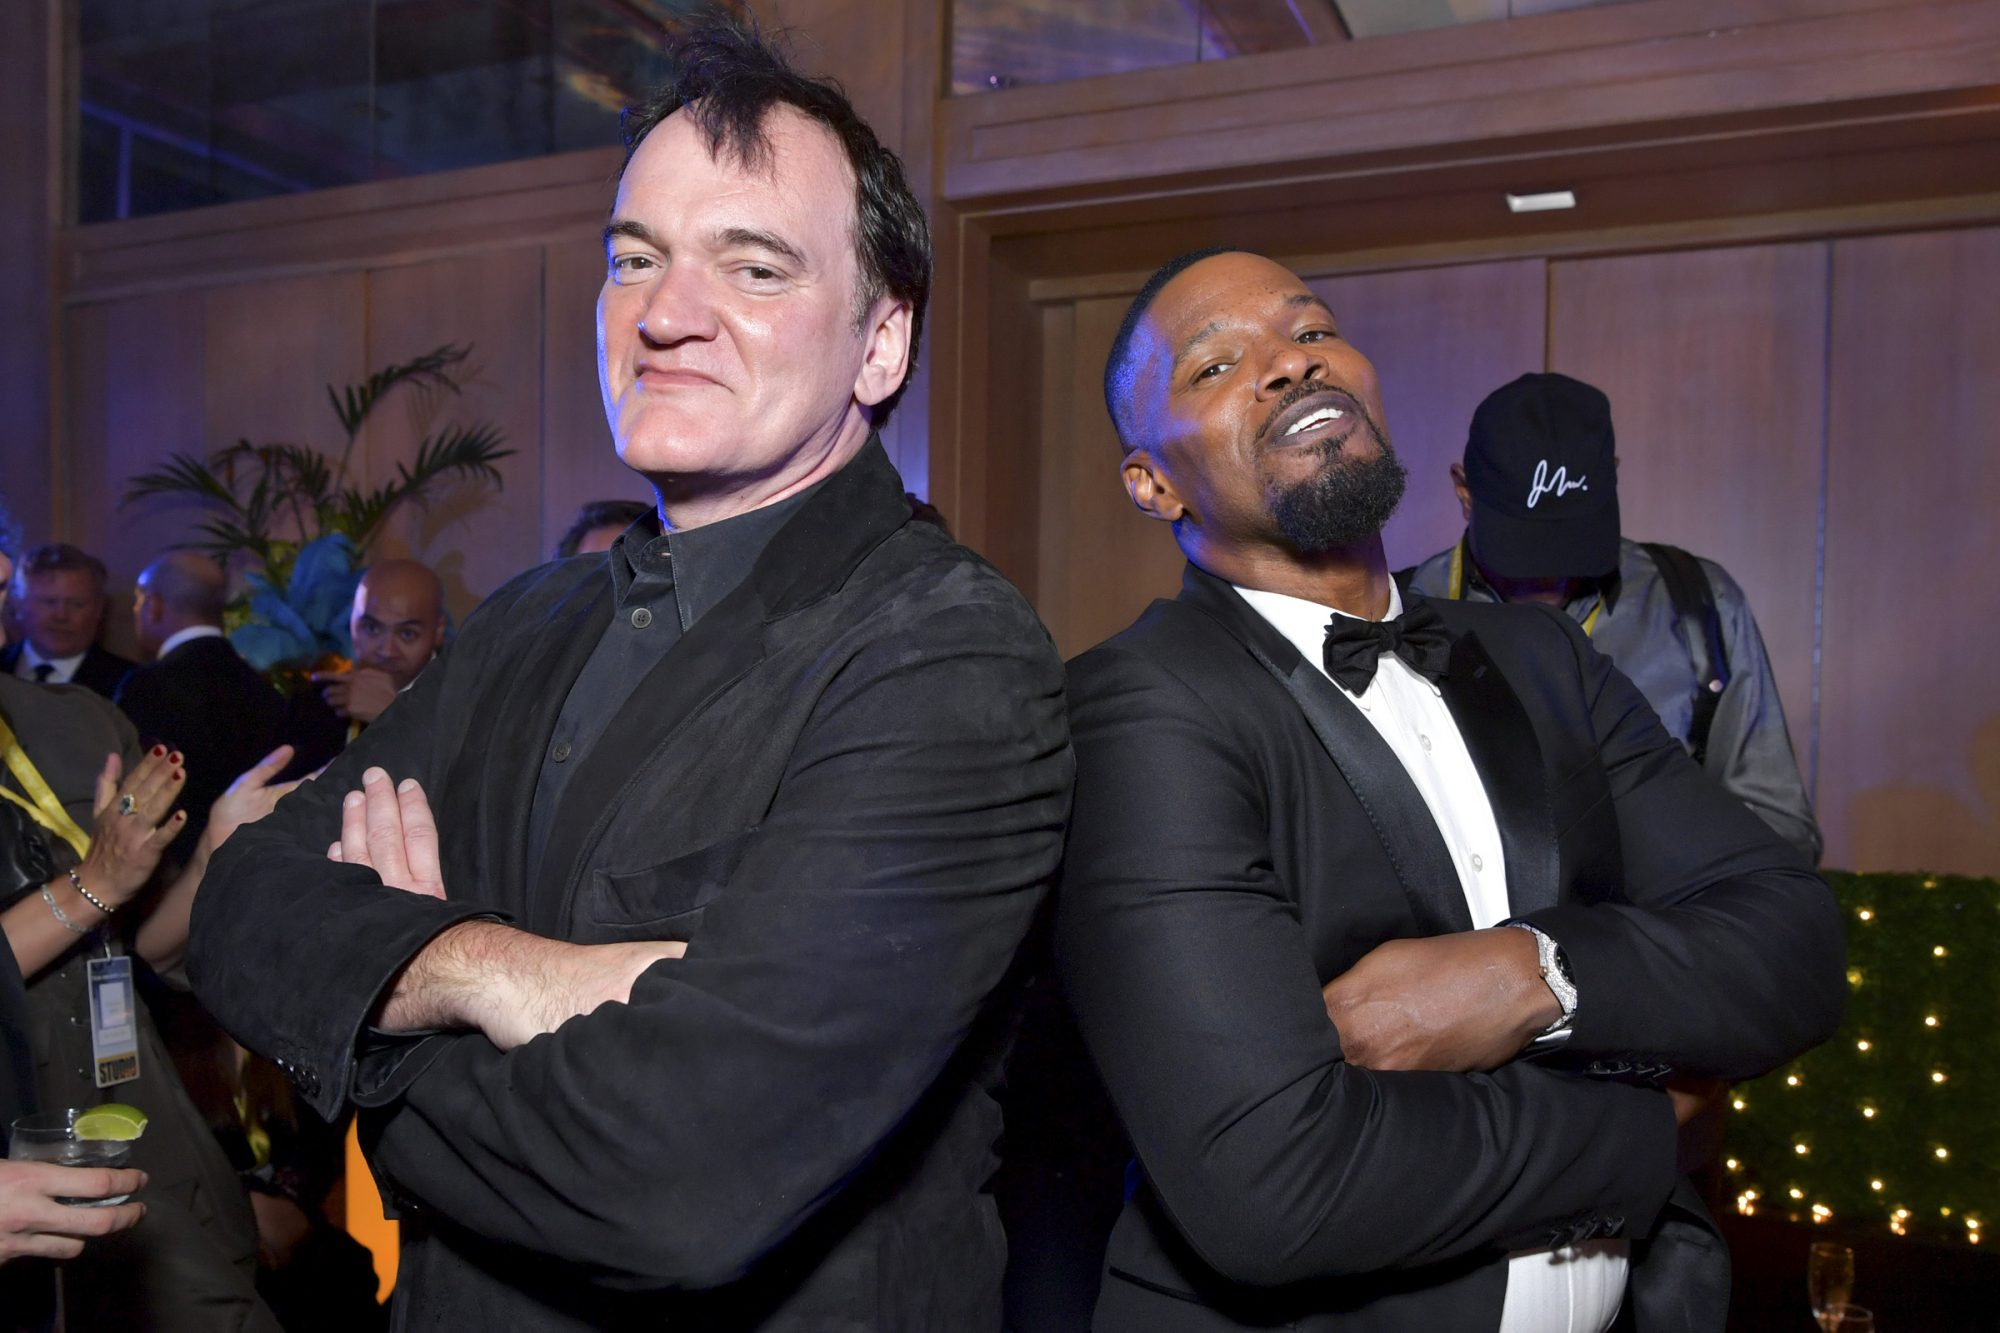 Quentin Tarantino and Jamie Foxx